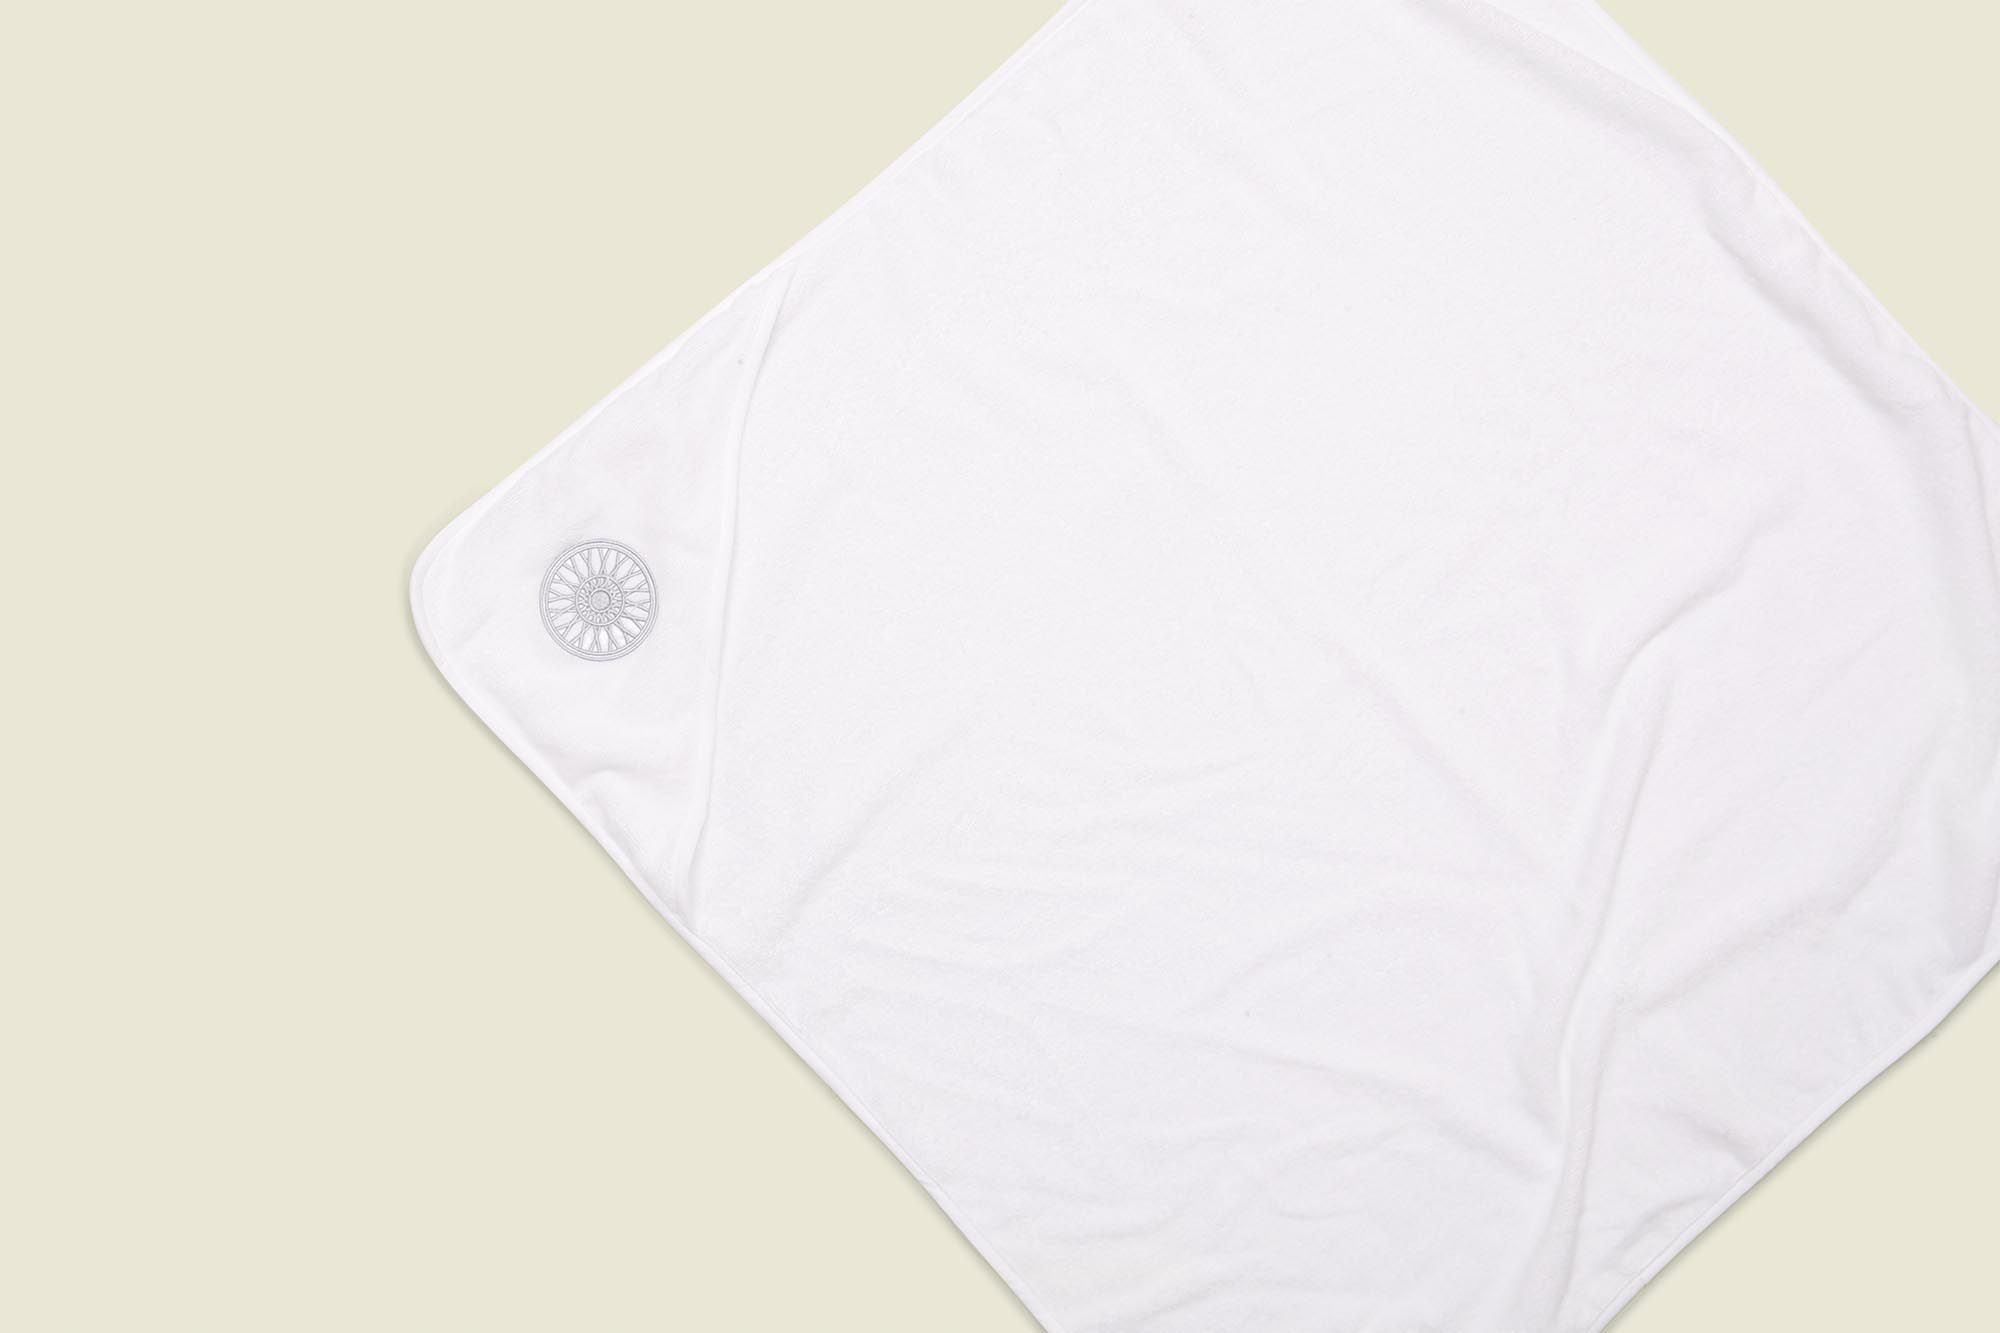 White washcloth